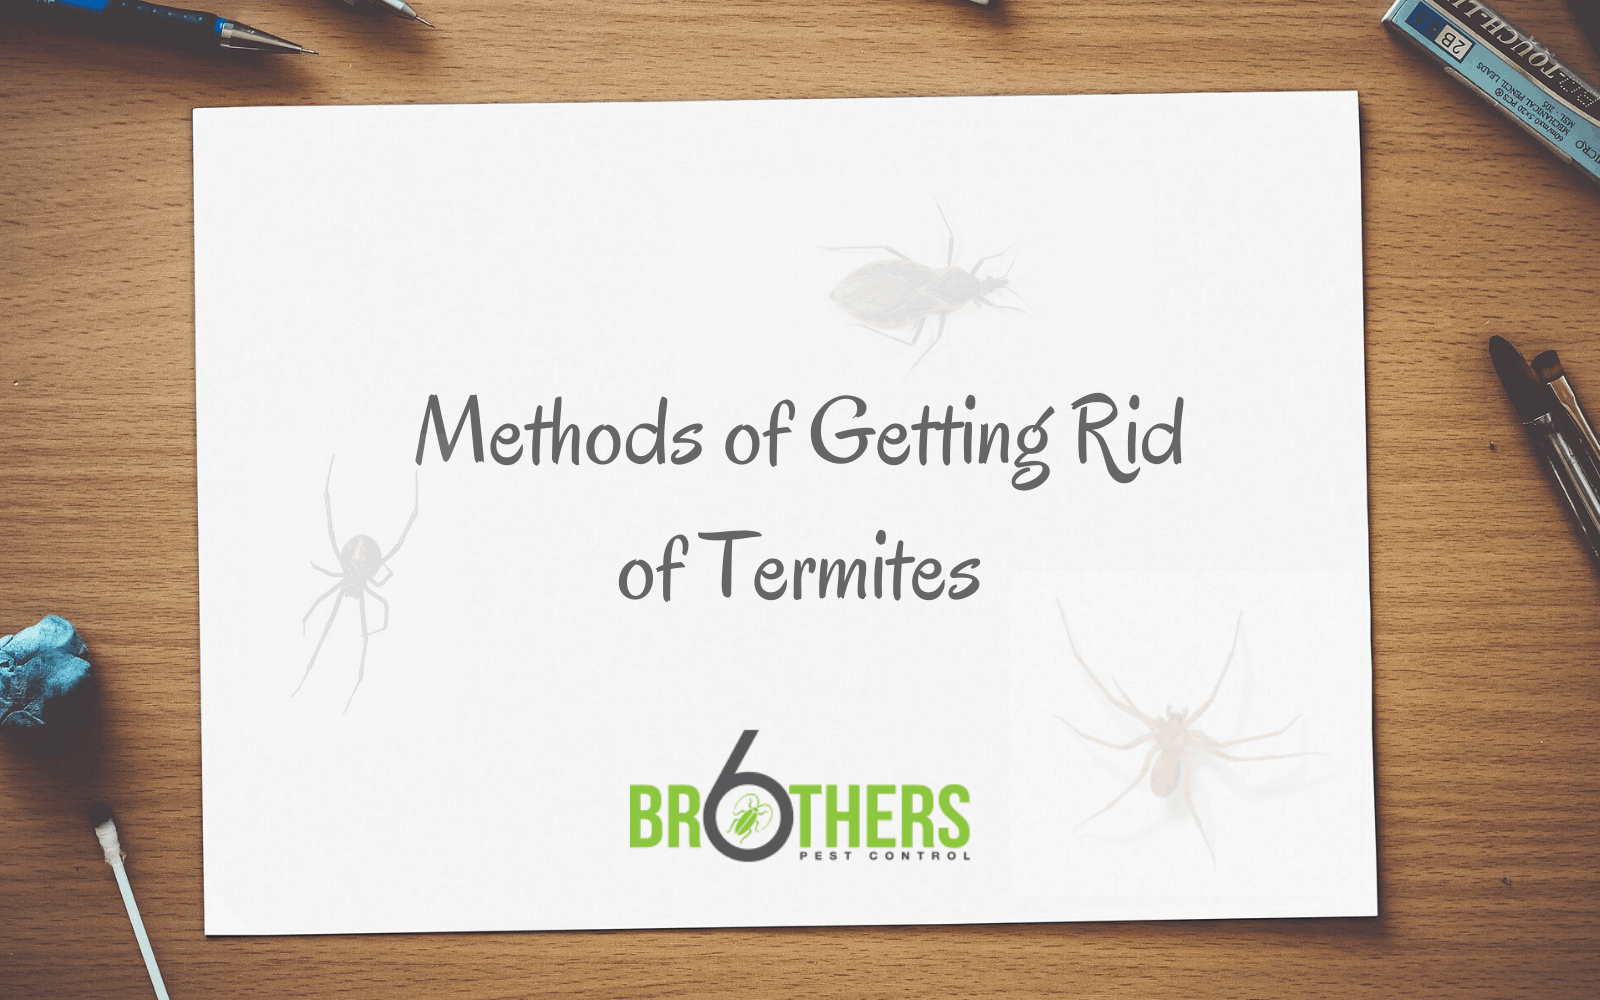 Effective Methods of Getting Rid Of Termites